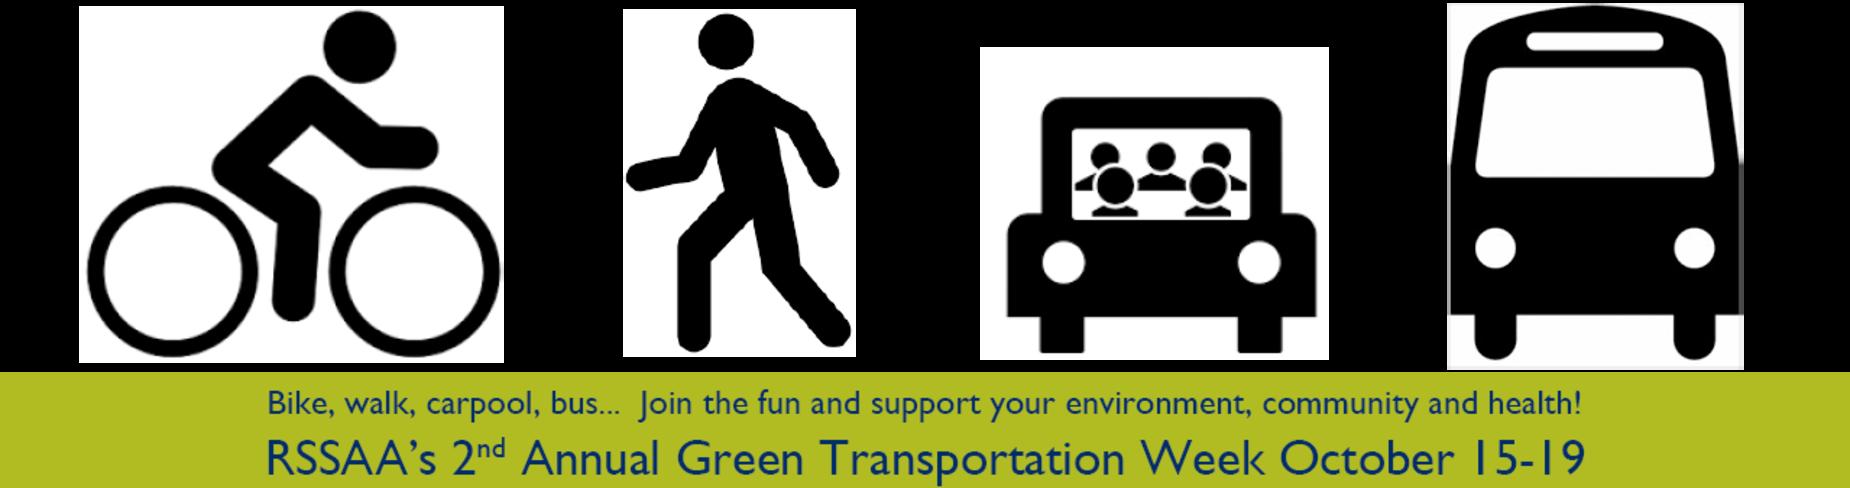 Green Transportation Week